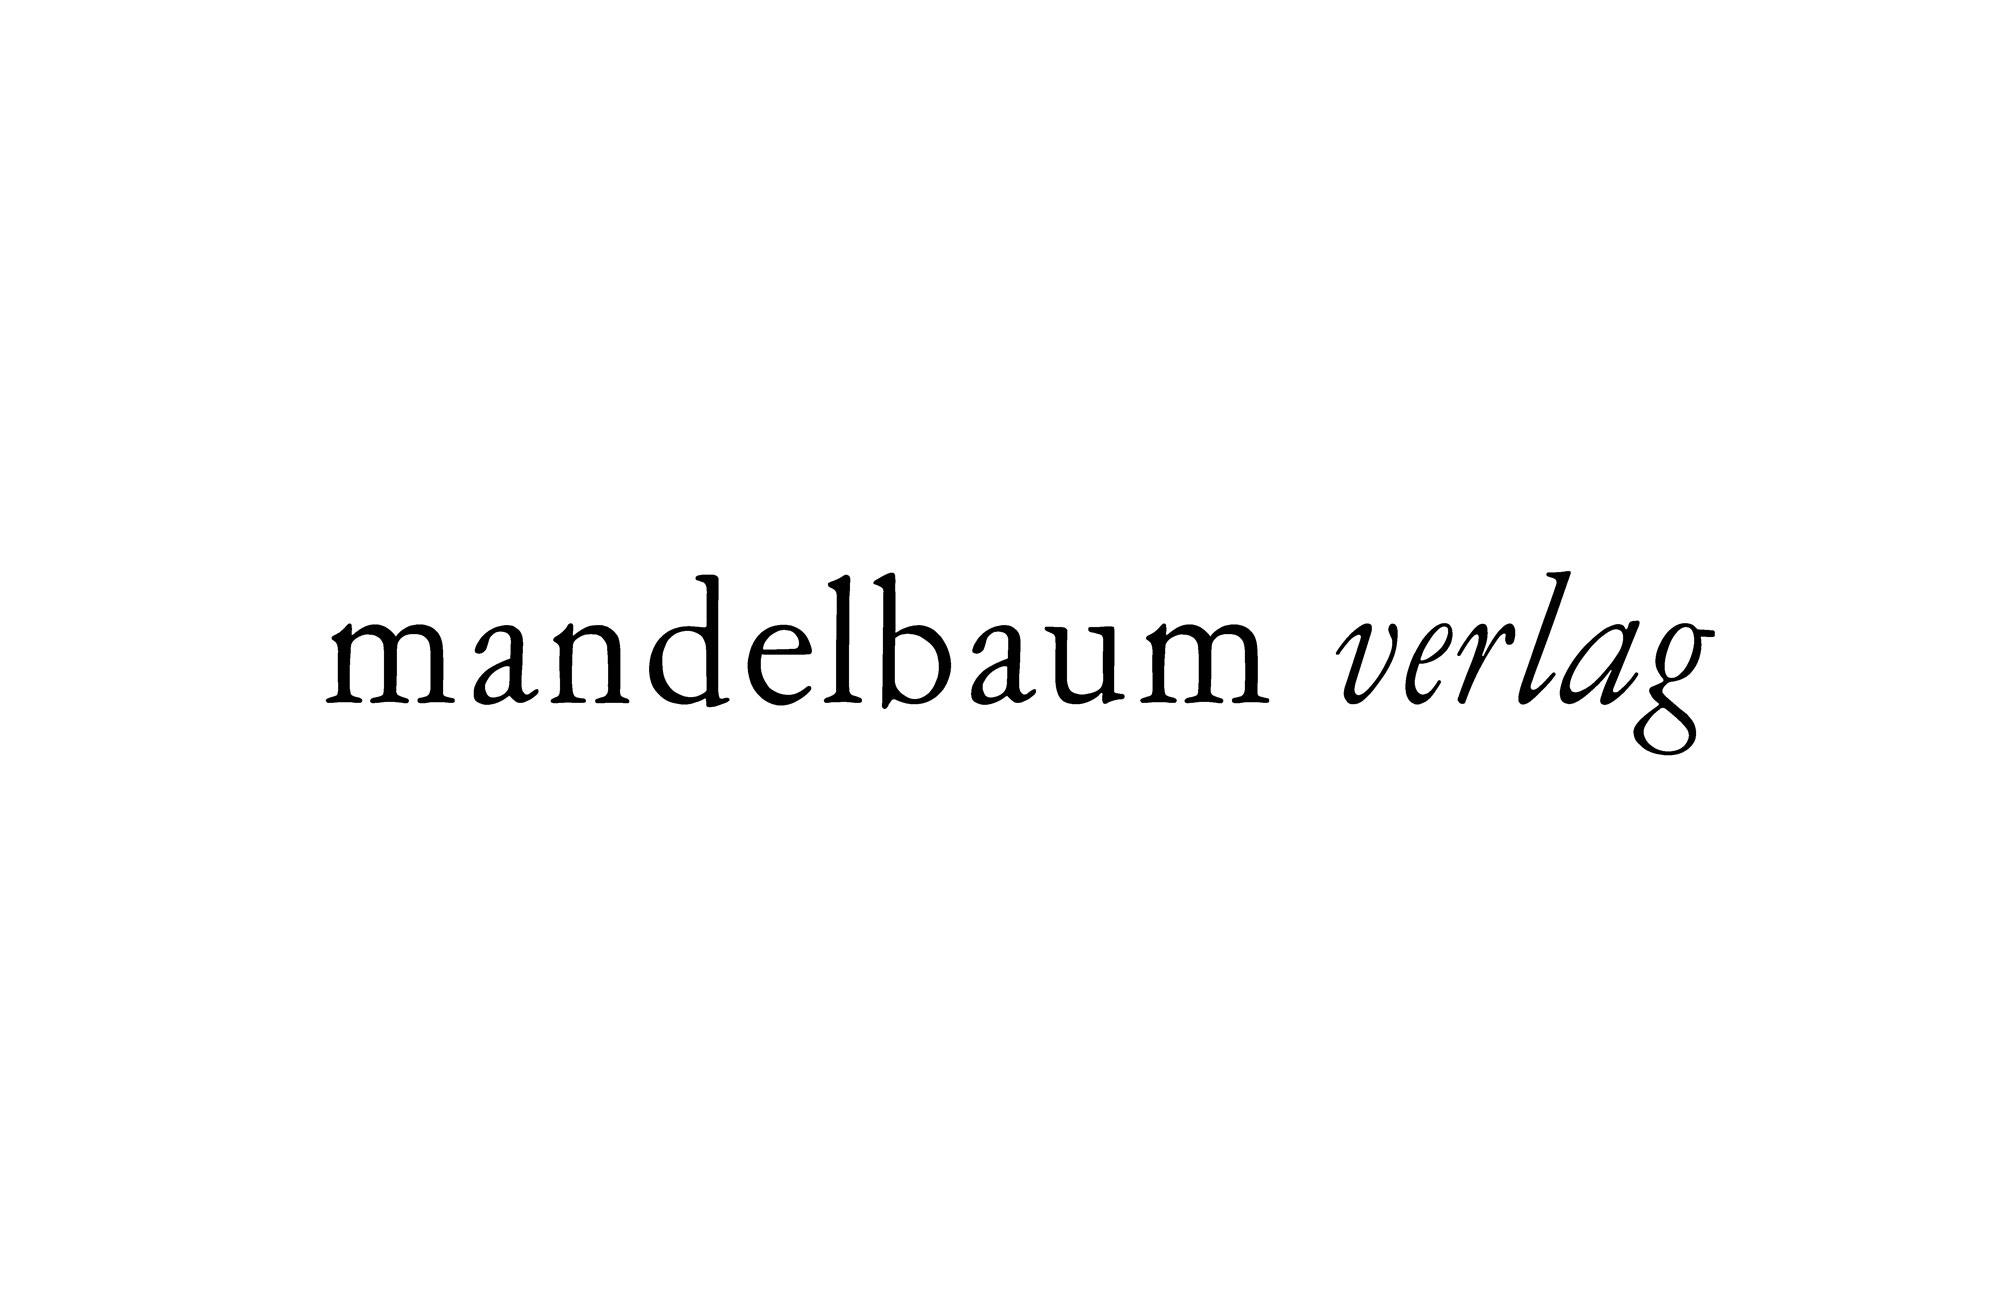 Logo Mandelbaum Verlag (Wien)